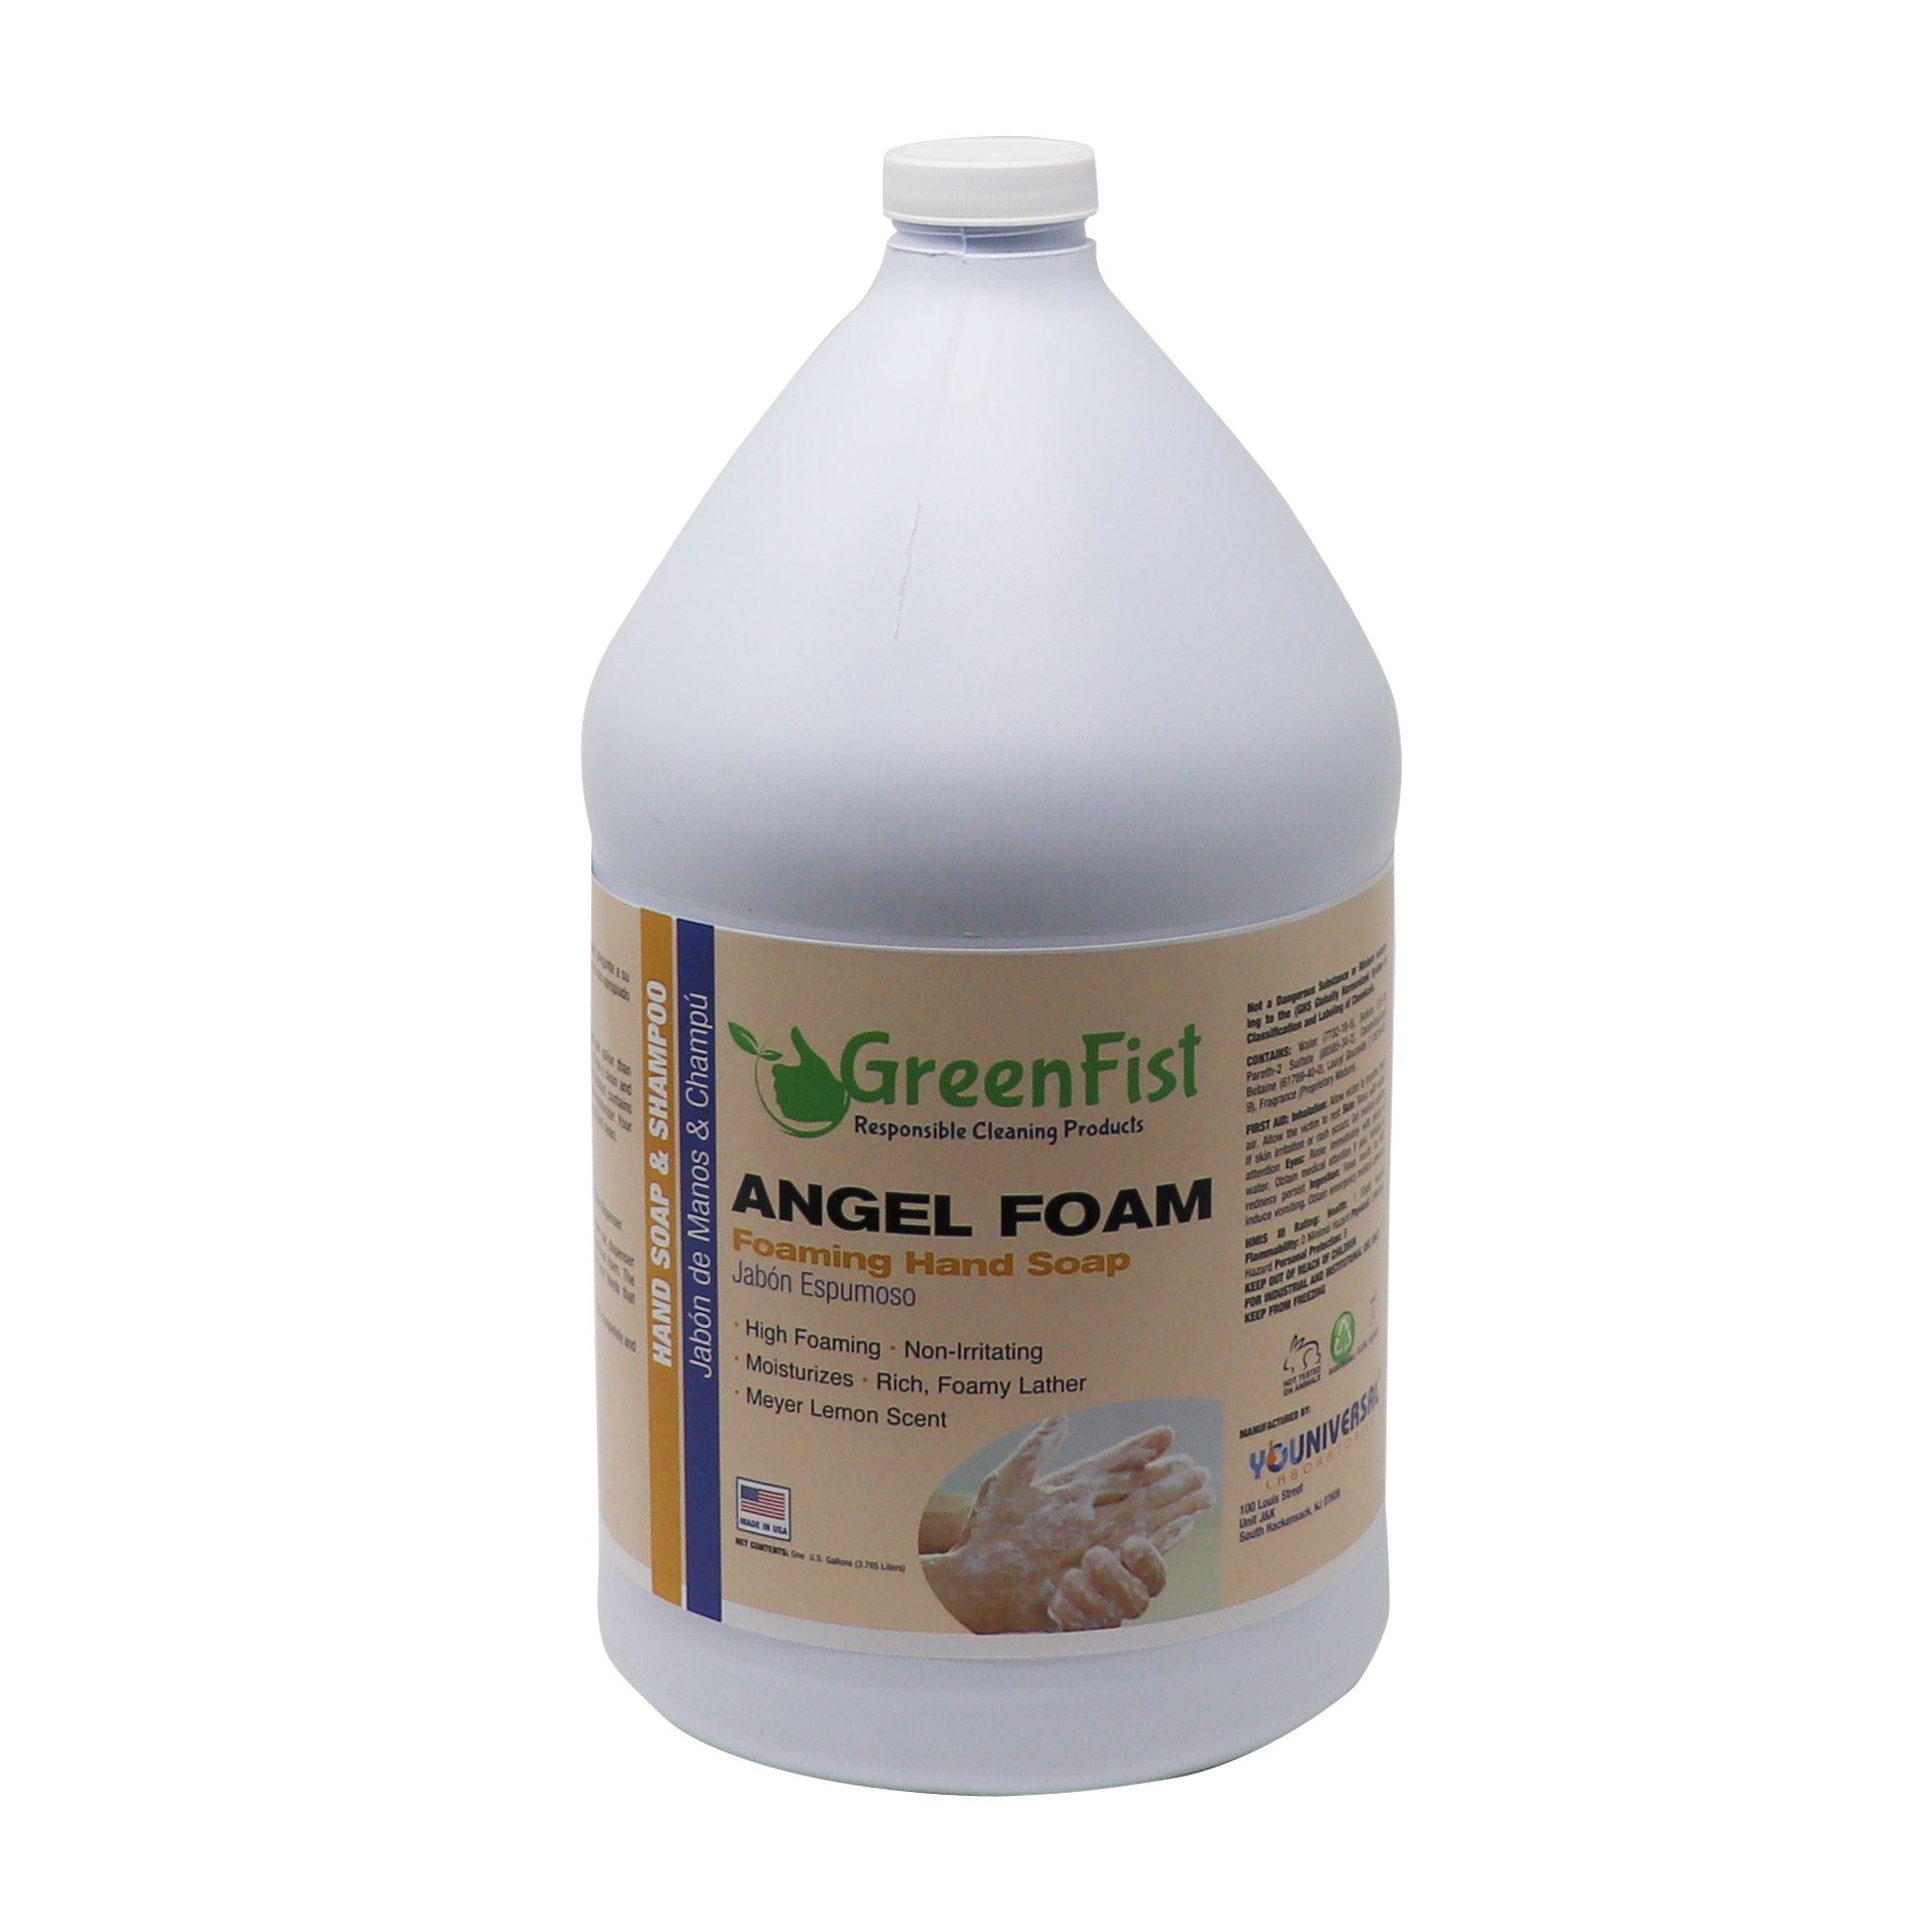 GreenFist Foaming Hand Washing Soap Refill Angel [ Foam ] Lemon Scent 4 Gallons (4x1)